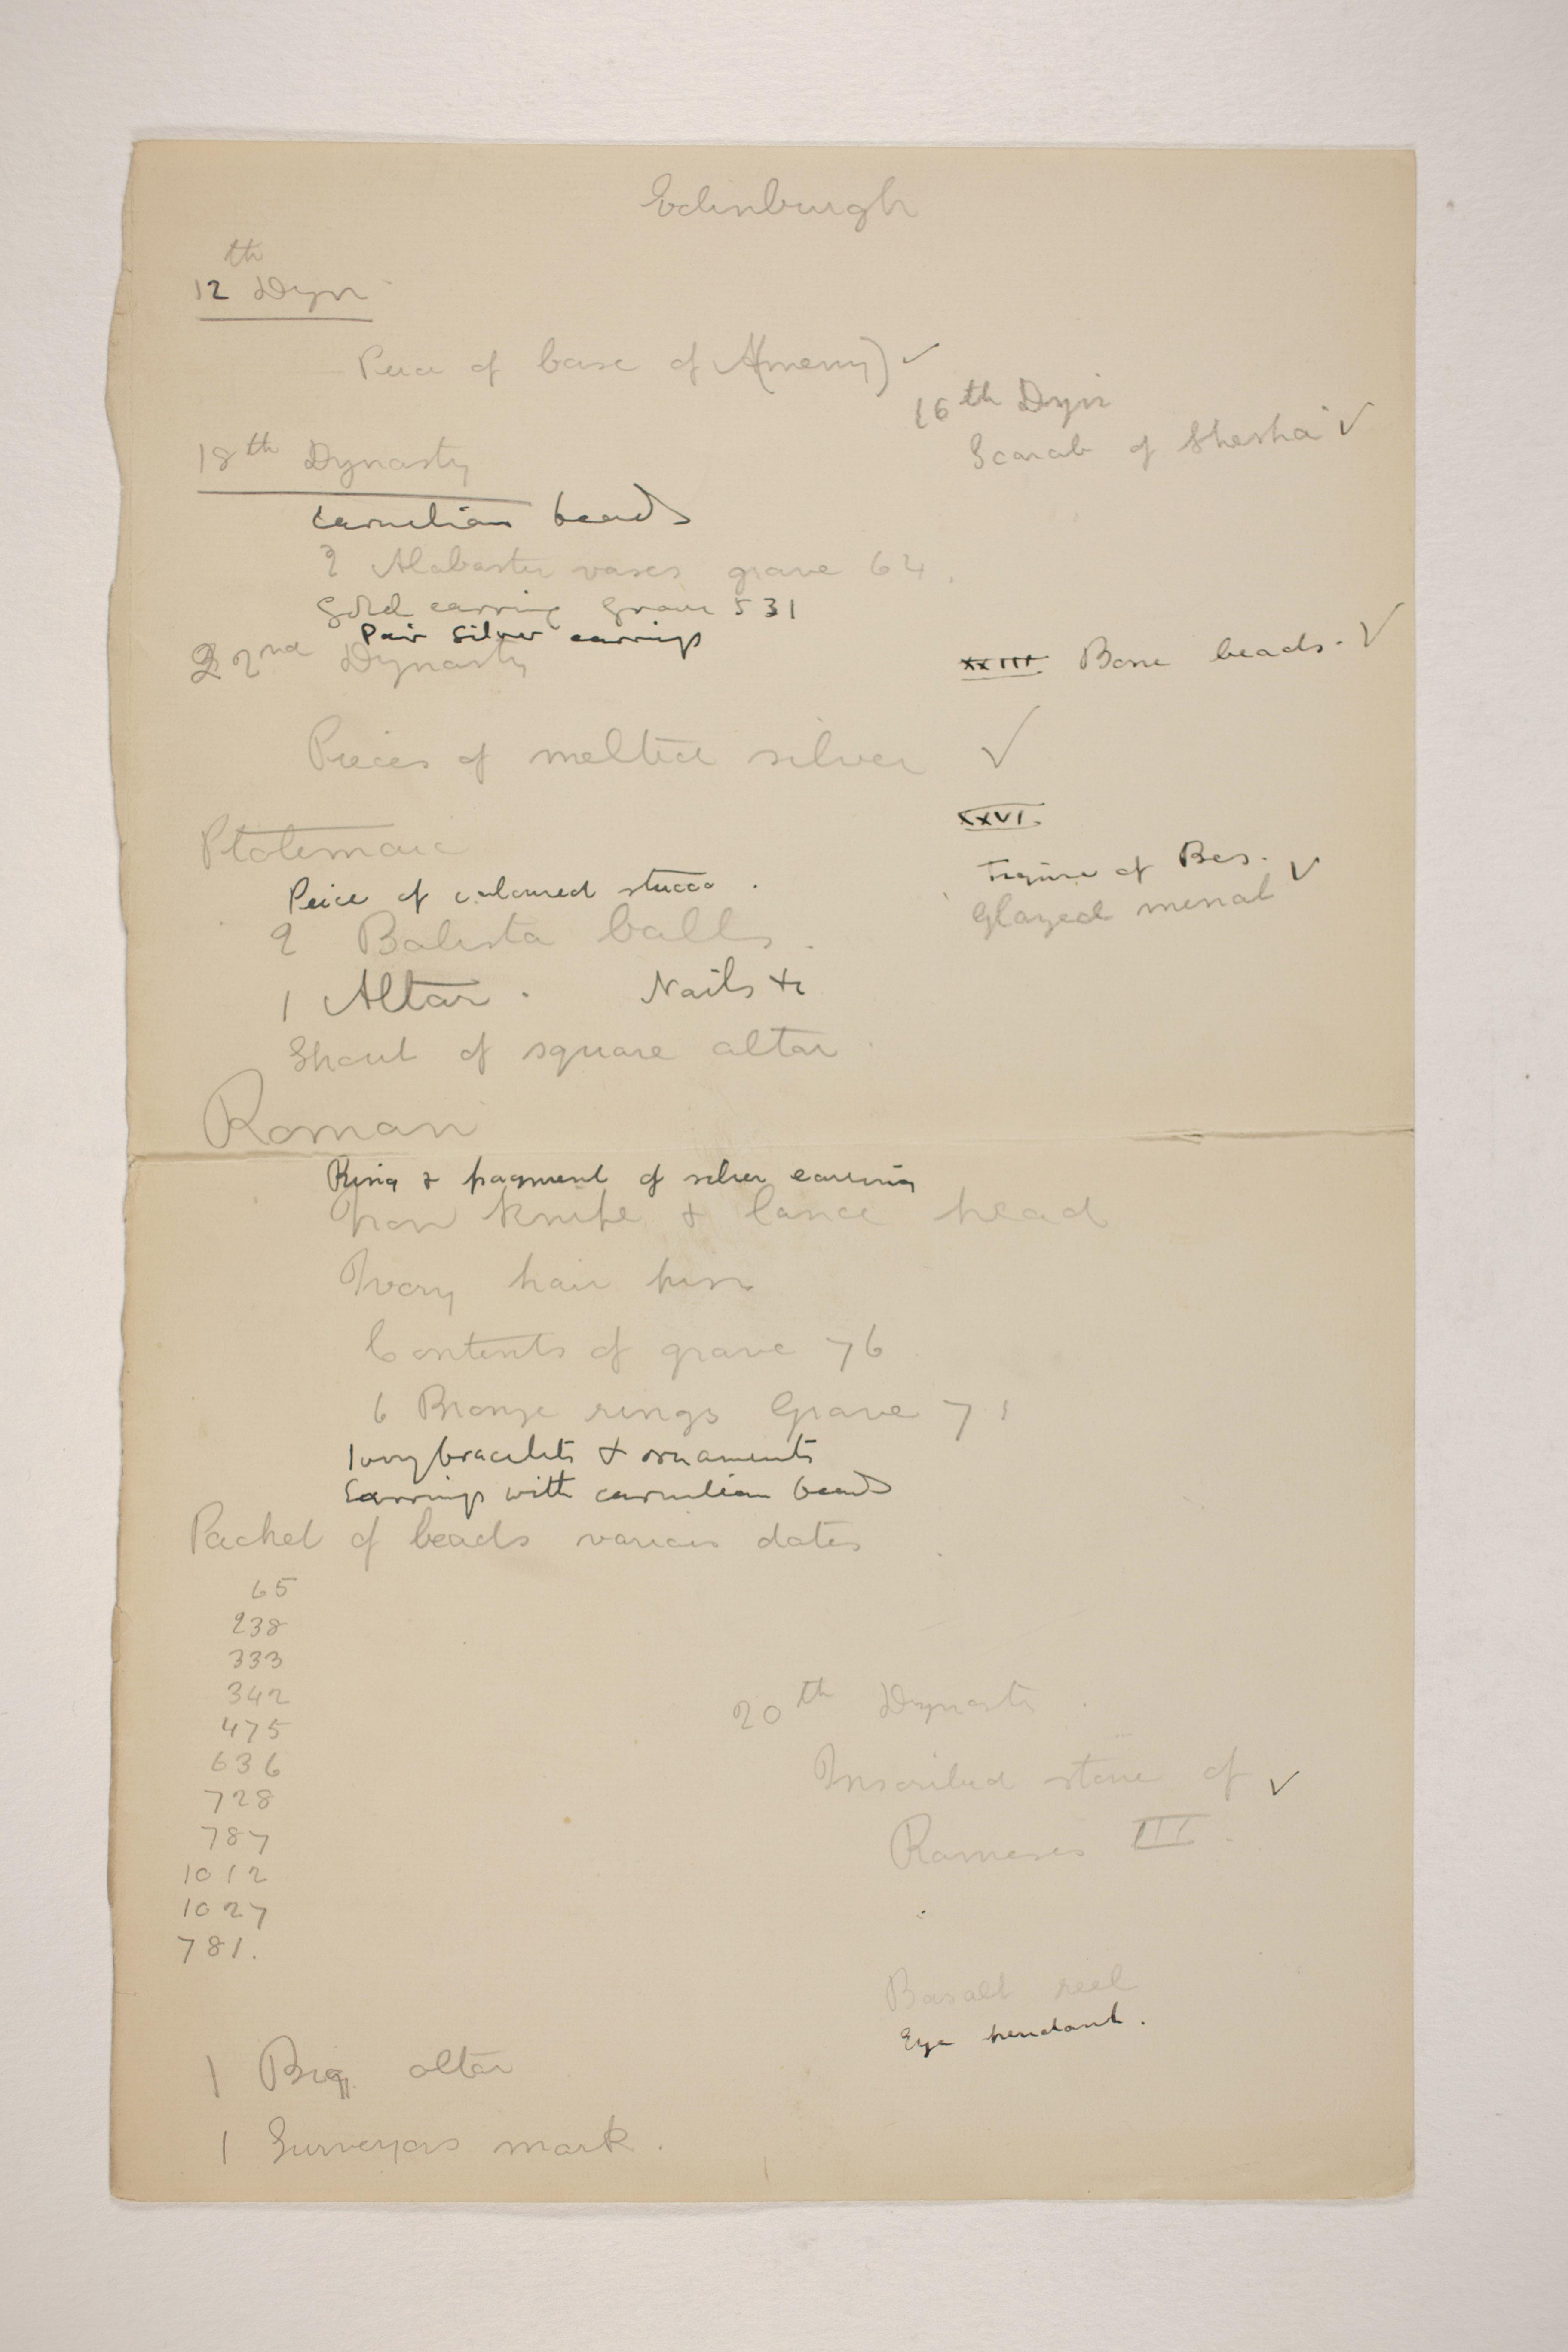 1905-06 Eastern Delta: Belbeis, Tell el-Rataba, Saft el-Hinna, Tell el-Yahudiya, Shaghanbeh, Ghita Individual institution list  PMA/WFP1/D/14/10